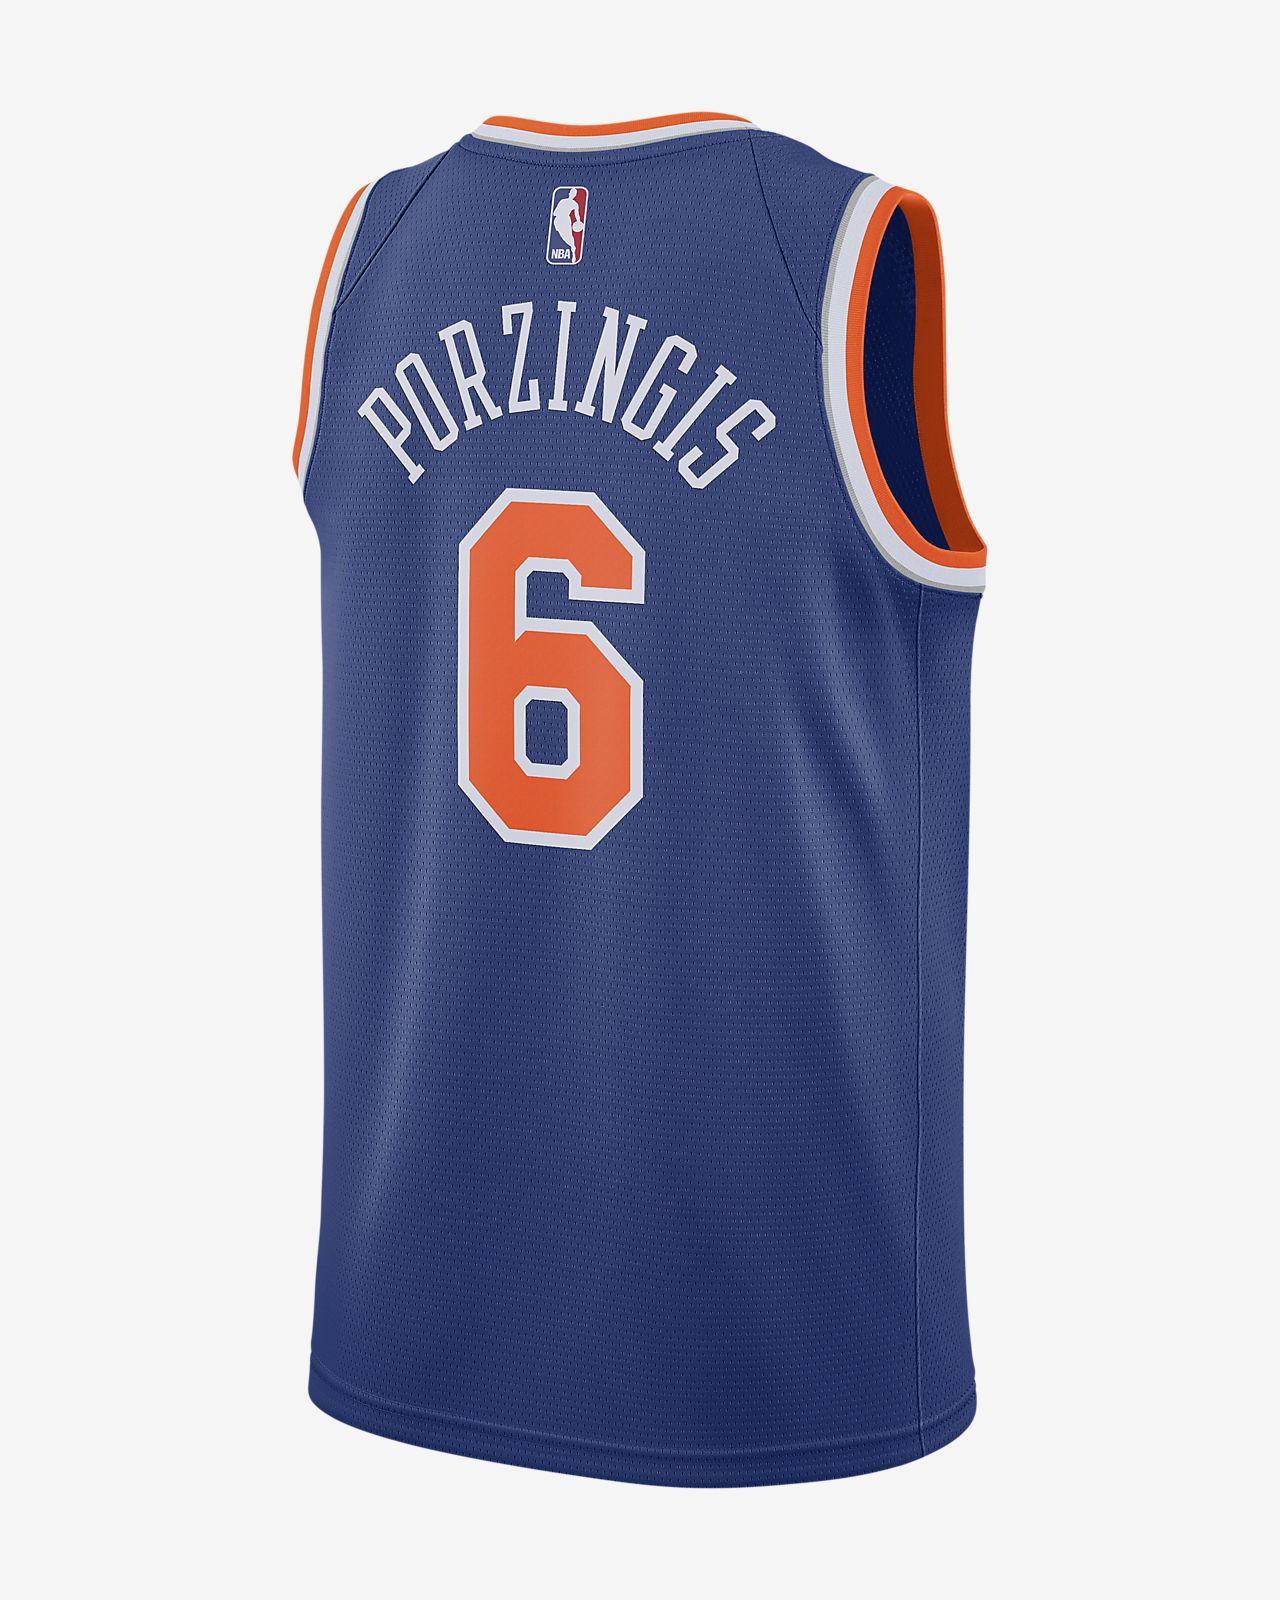 2f436a1b1 Men s Nike NBA Connected Jersey. Kristaps Porziņģis Icon Edition Swingman (New  York Knicks)